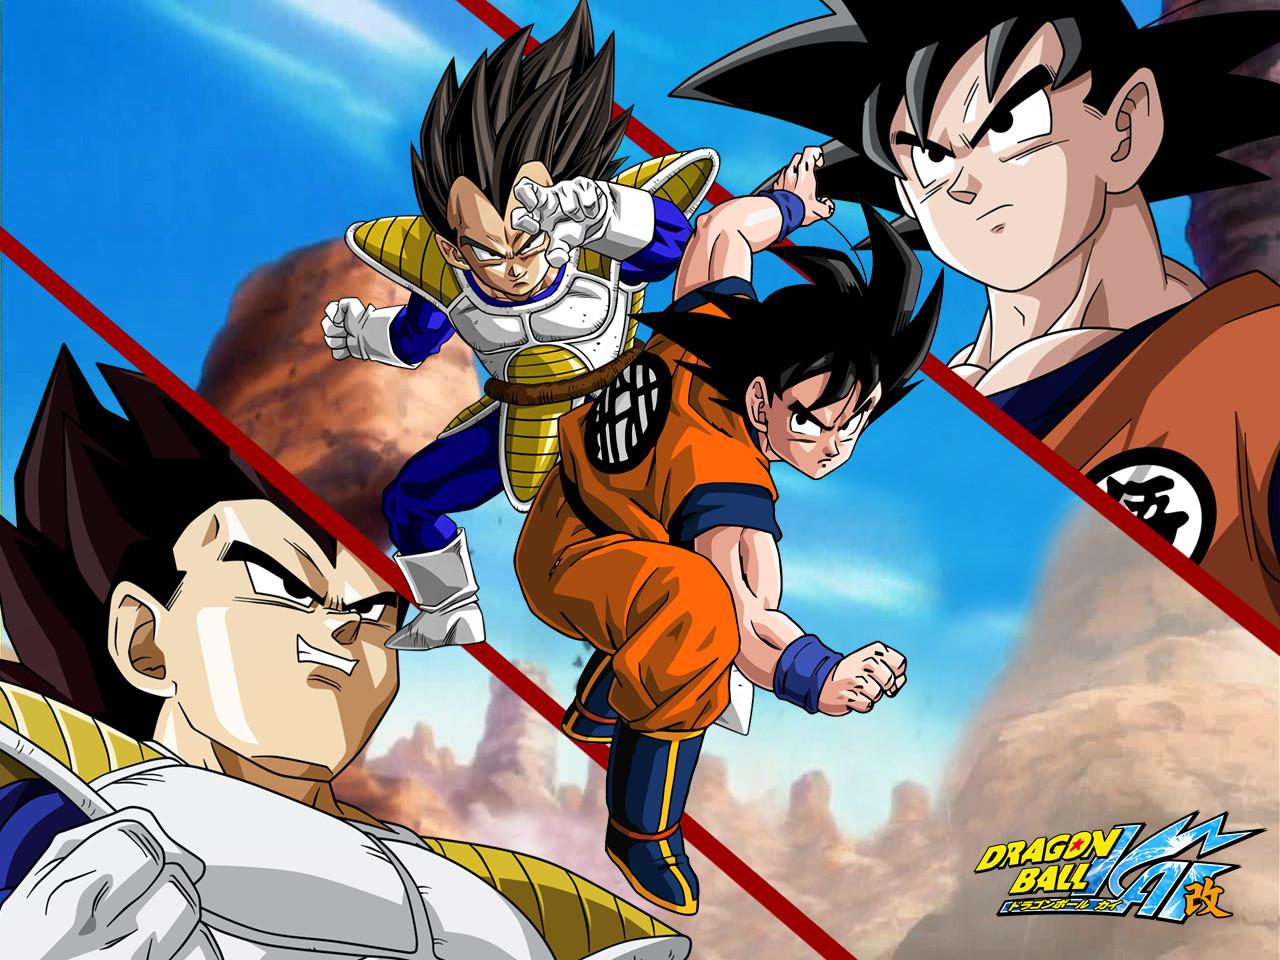 Goku VS Vegeta Wallpaper   Taringa 1280x960